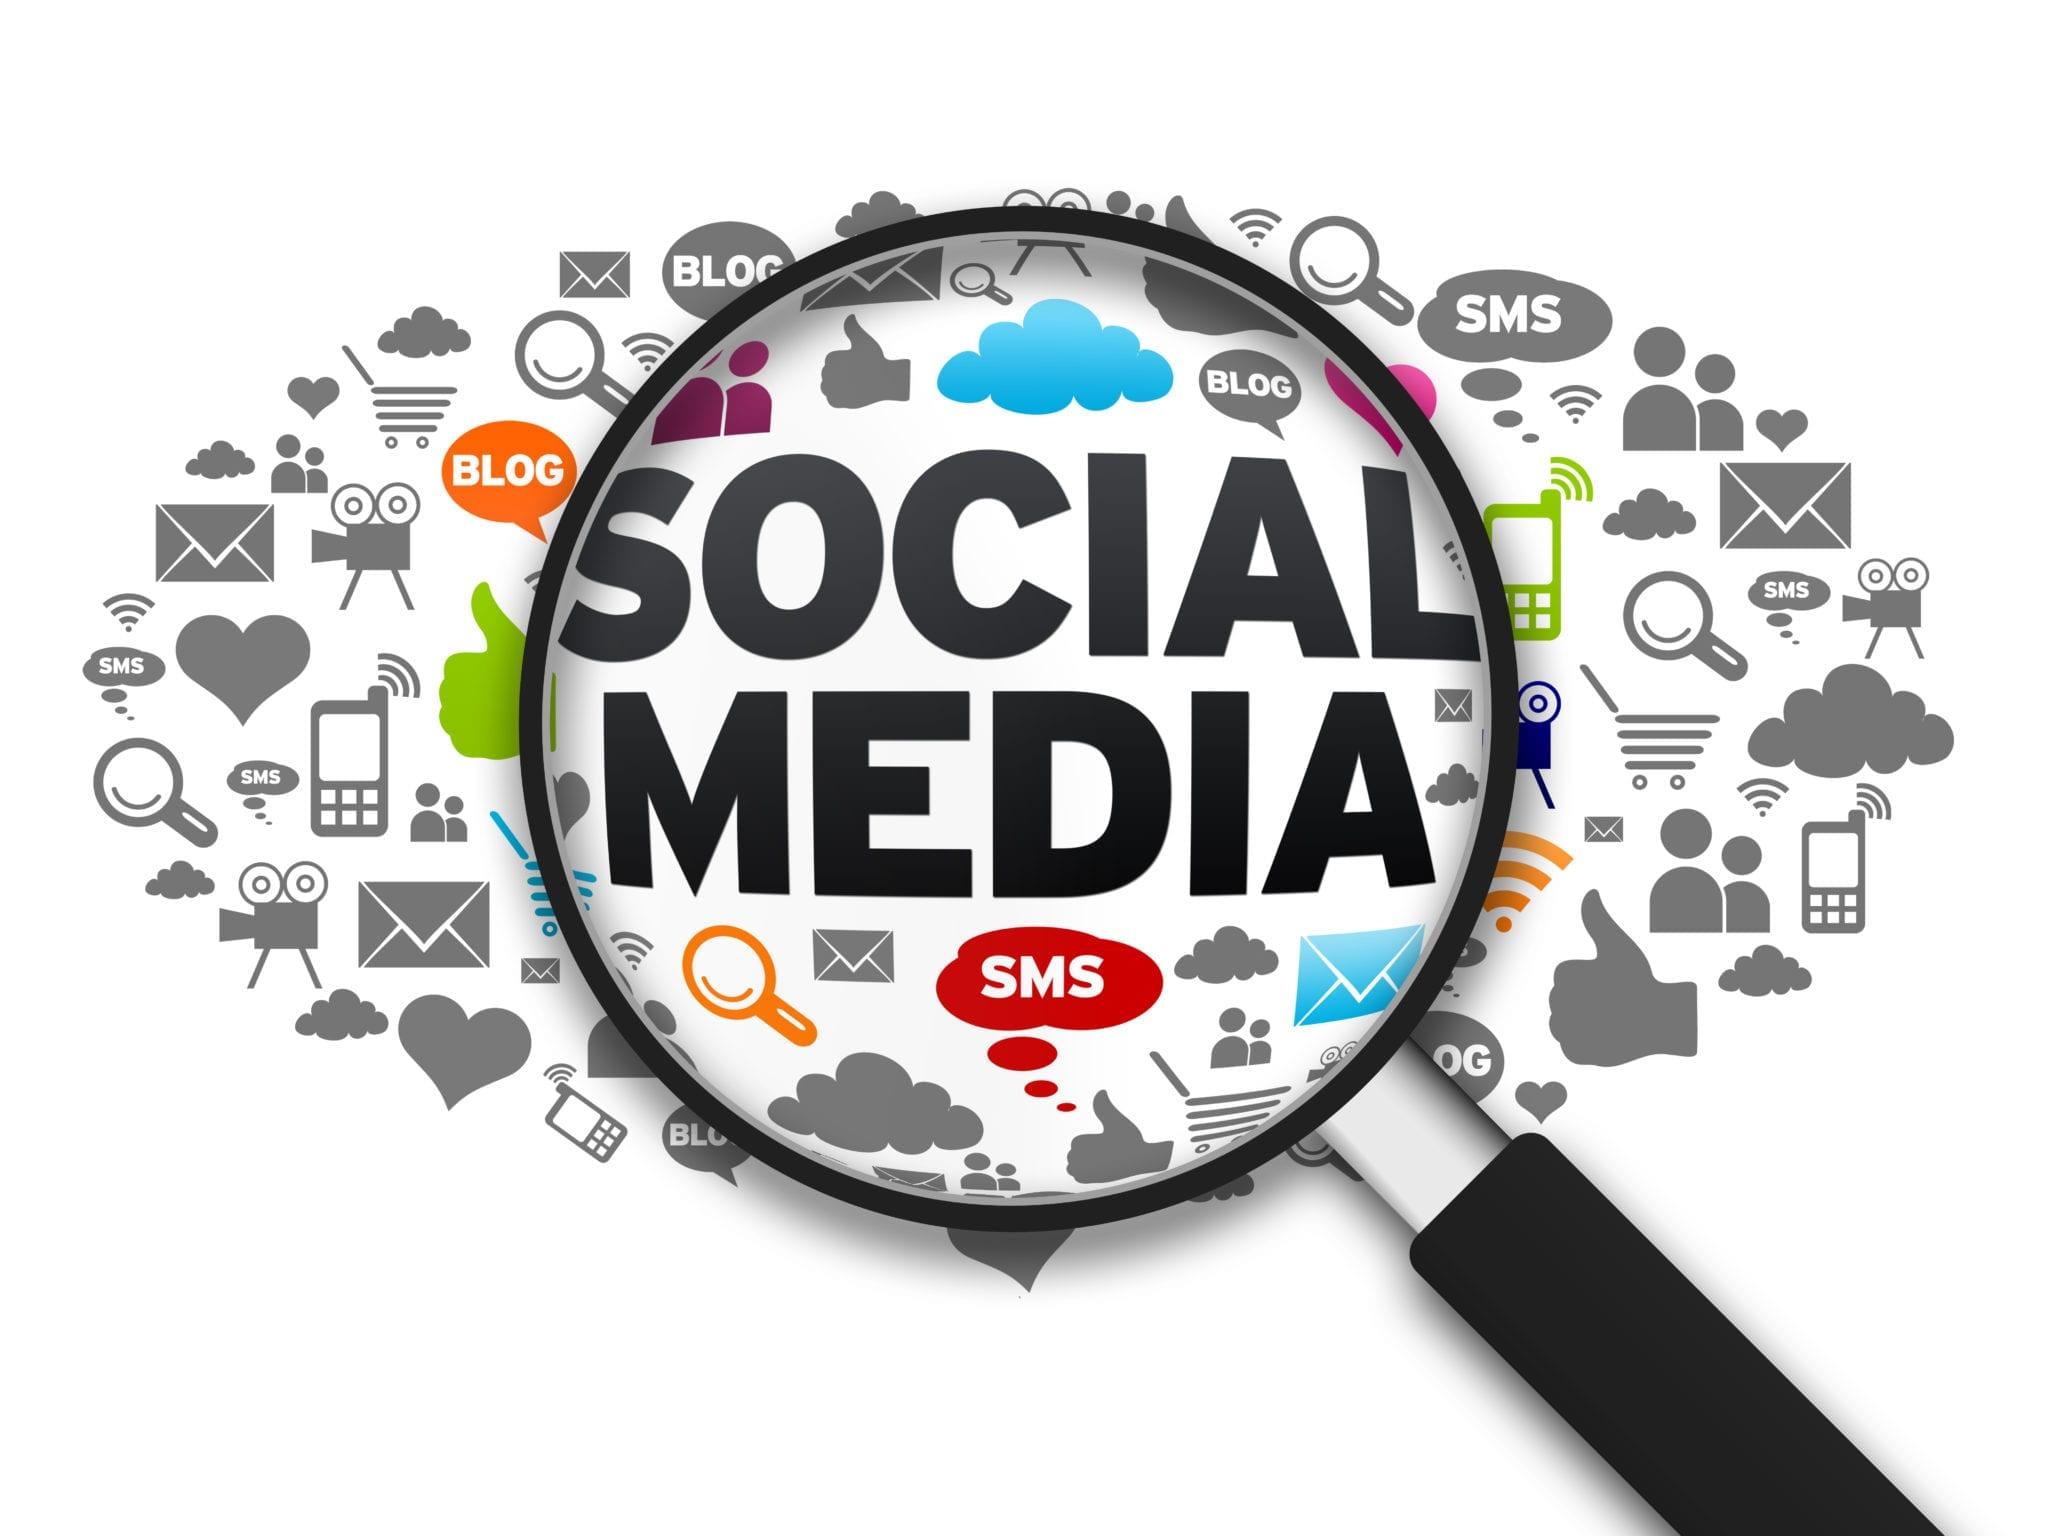 friday-poll-results-social-media-performance-for-sales-lead-generation.jpg